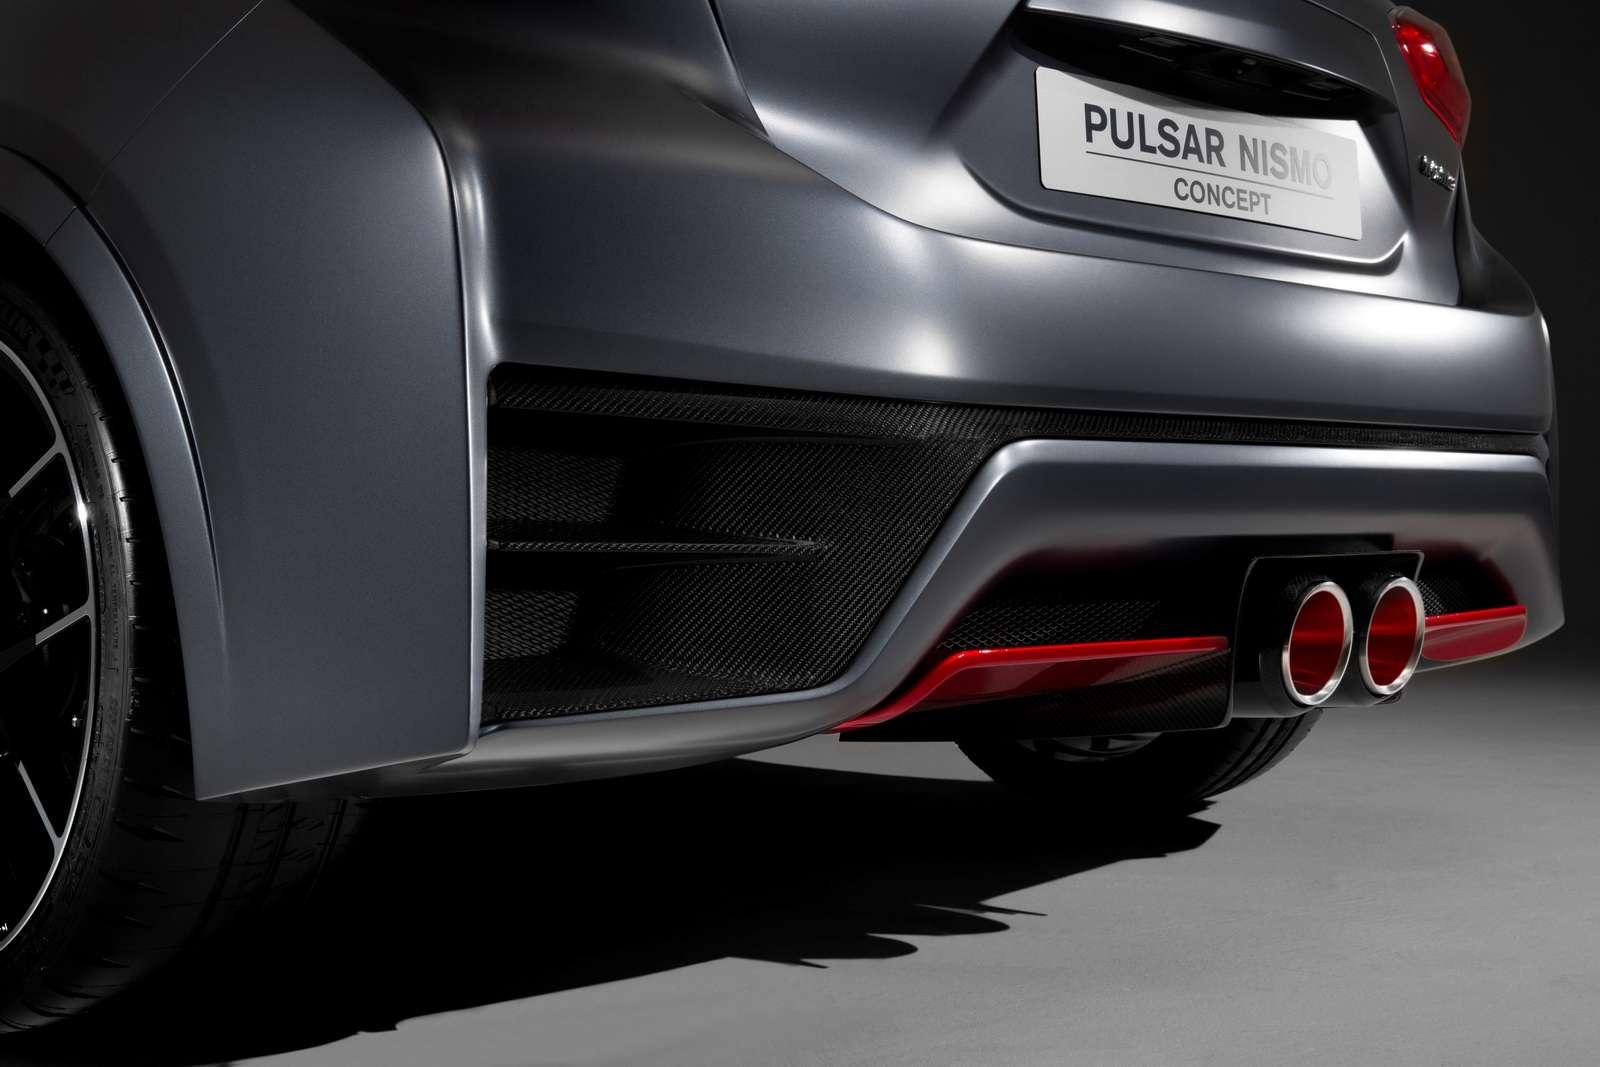 Nissan-Pulsar-Nismo-Concept-06